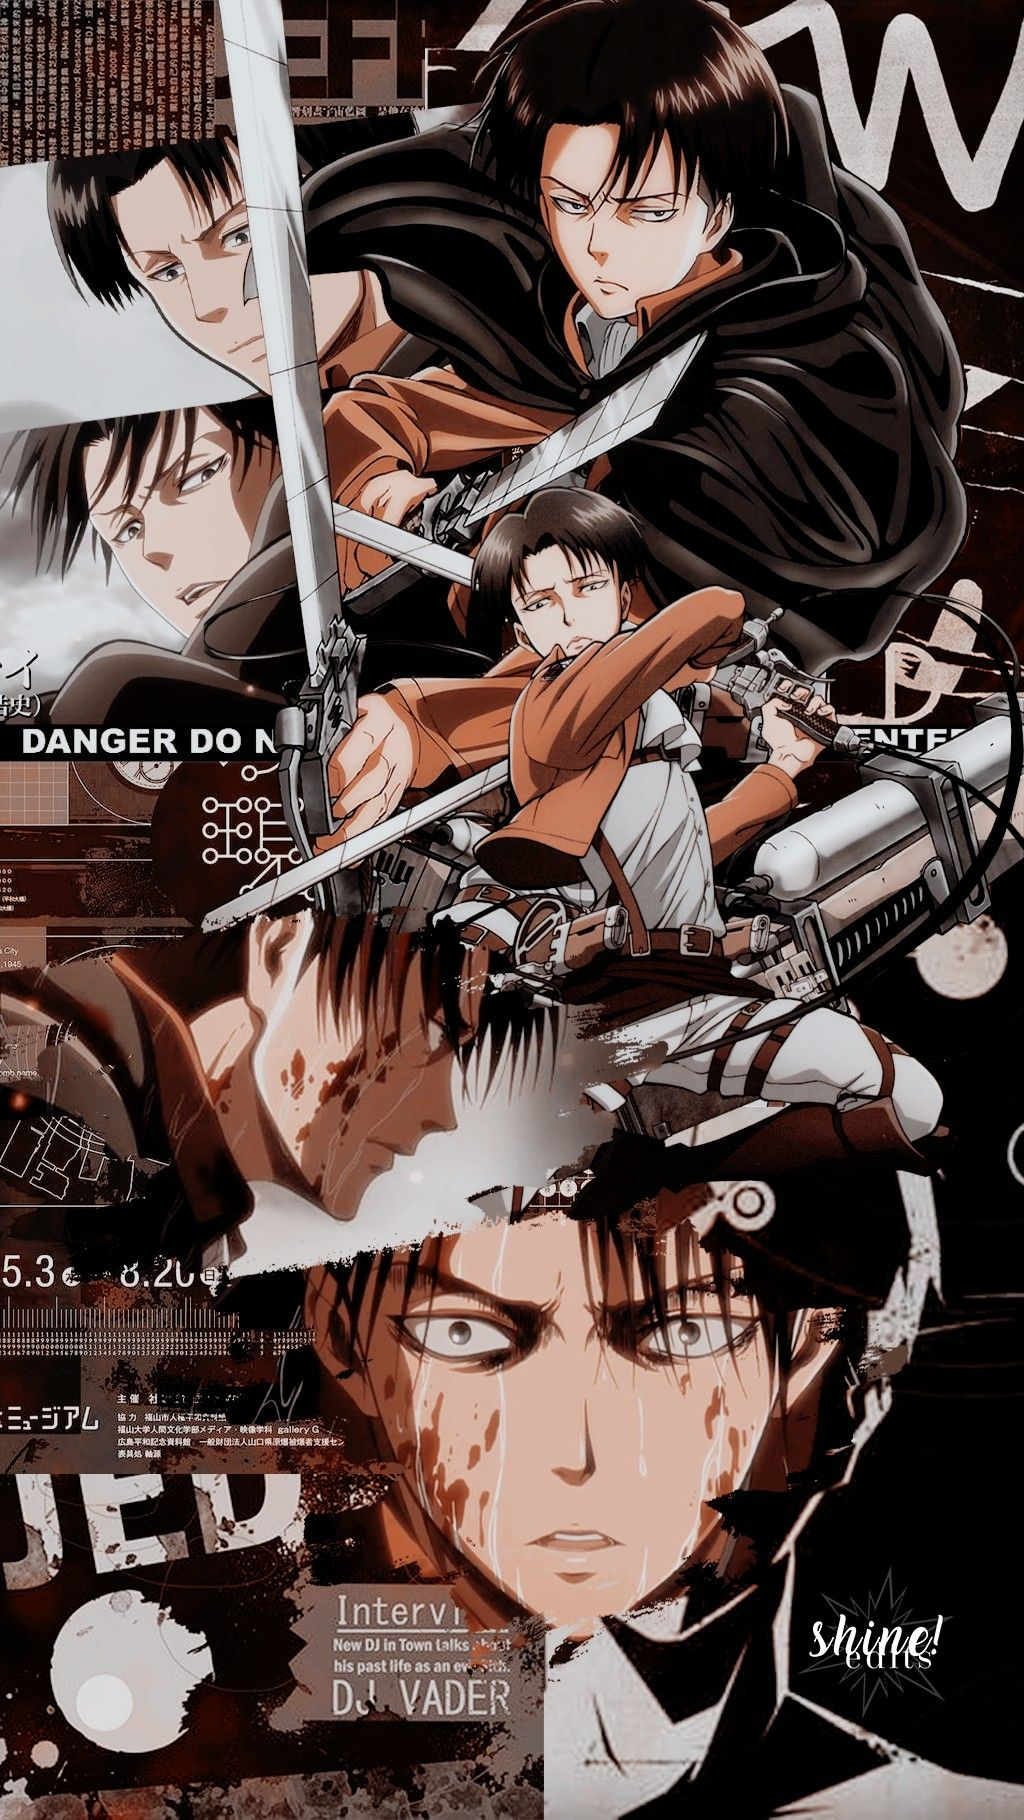 Levi Ackerman Lockscreen Shingeki No Kyojin Shinedlts On Twitter Anime Wallpaper Phone Cool Anime Wallpapers Cute Anime Wallpaper